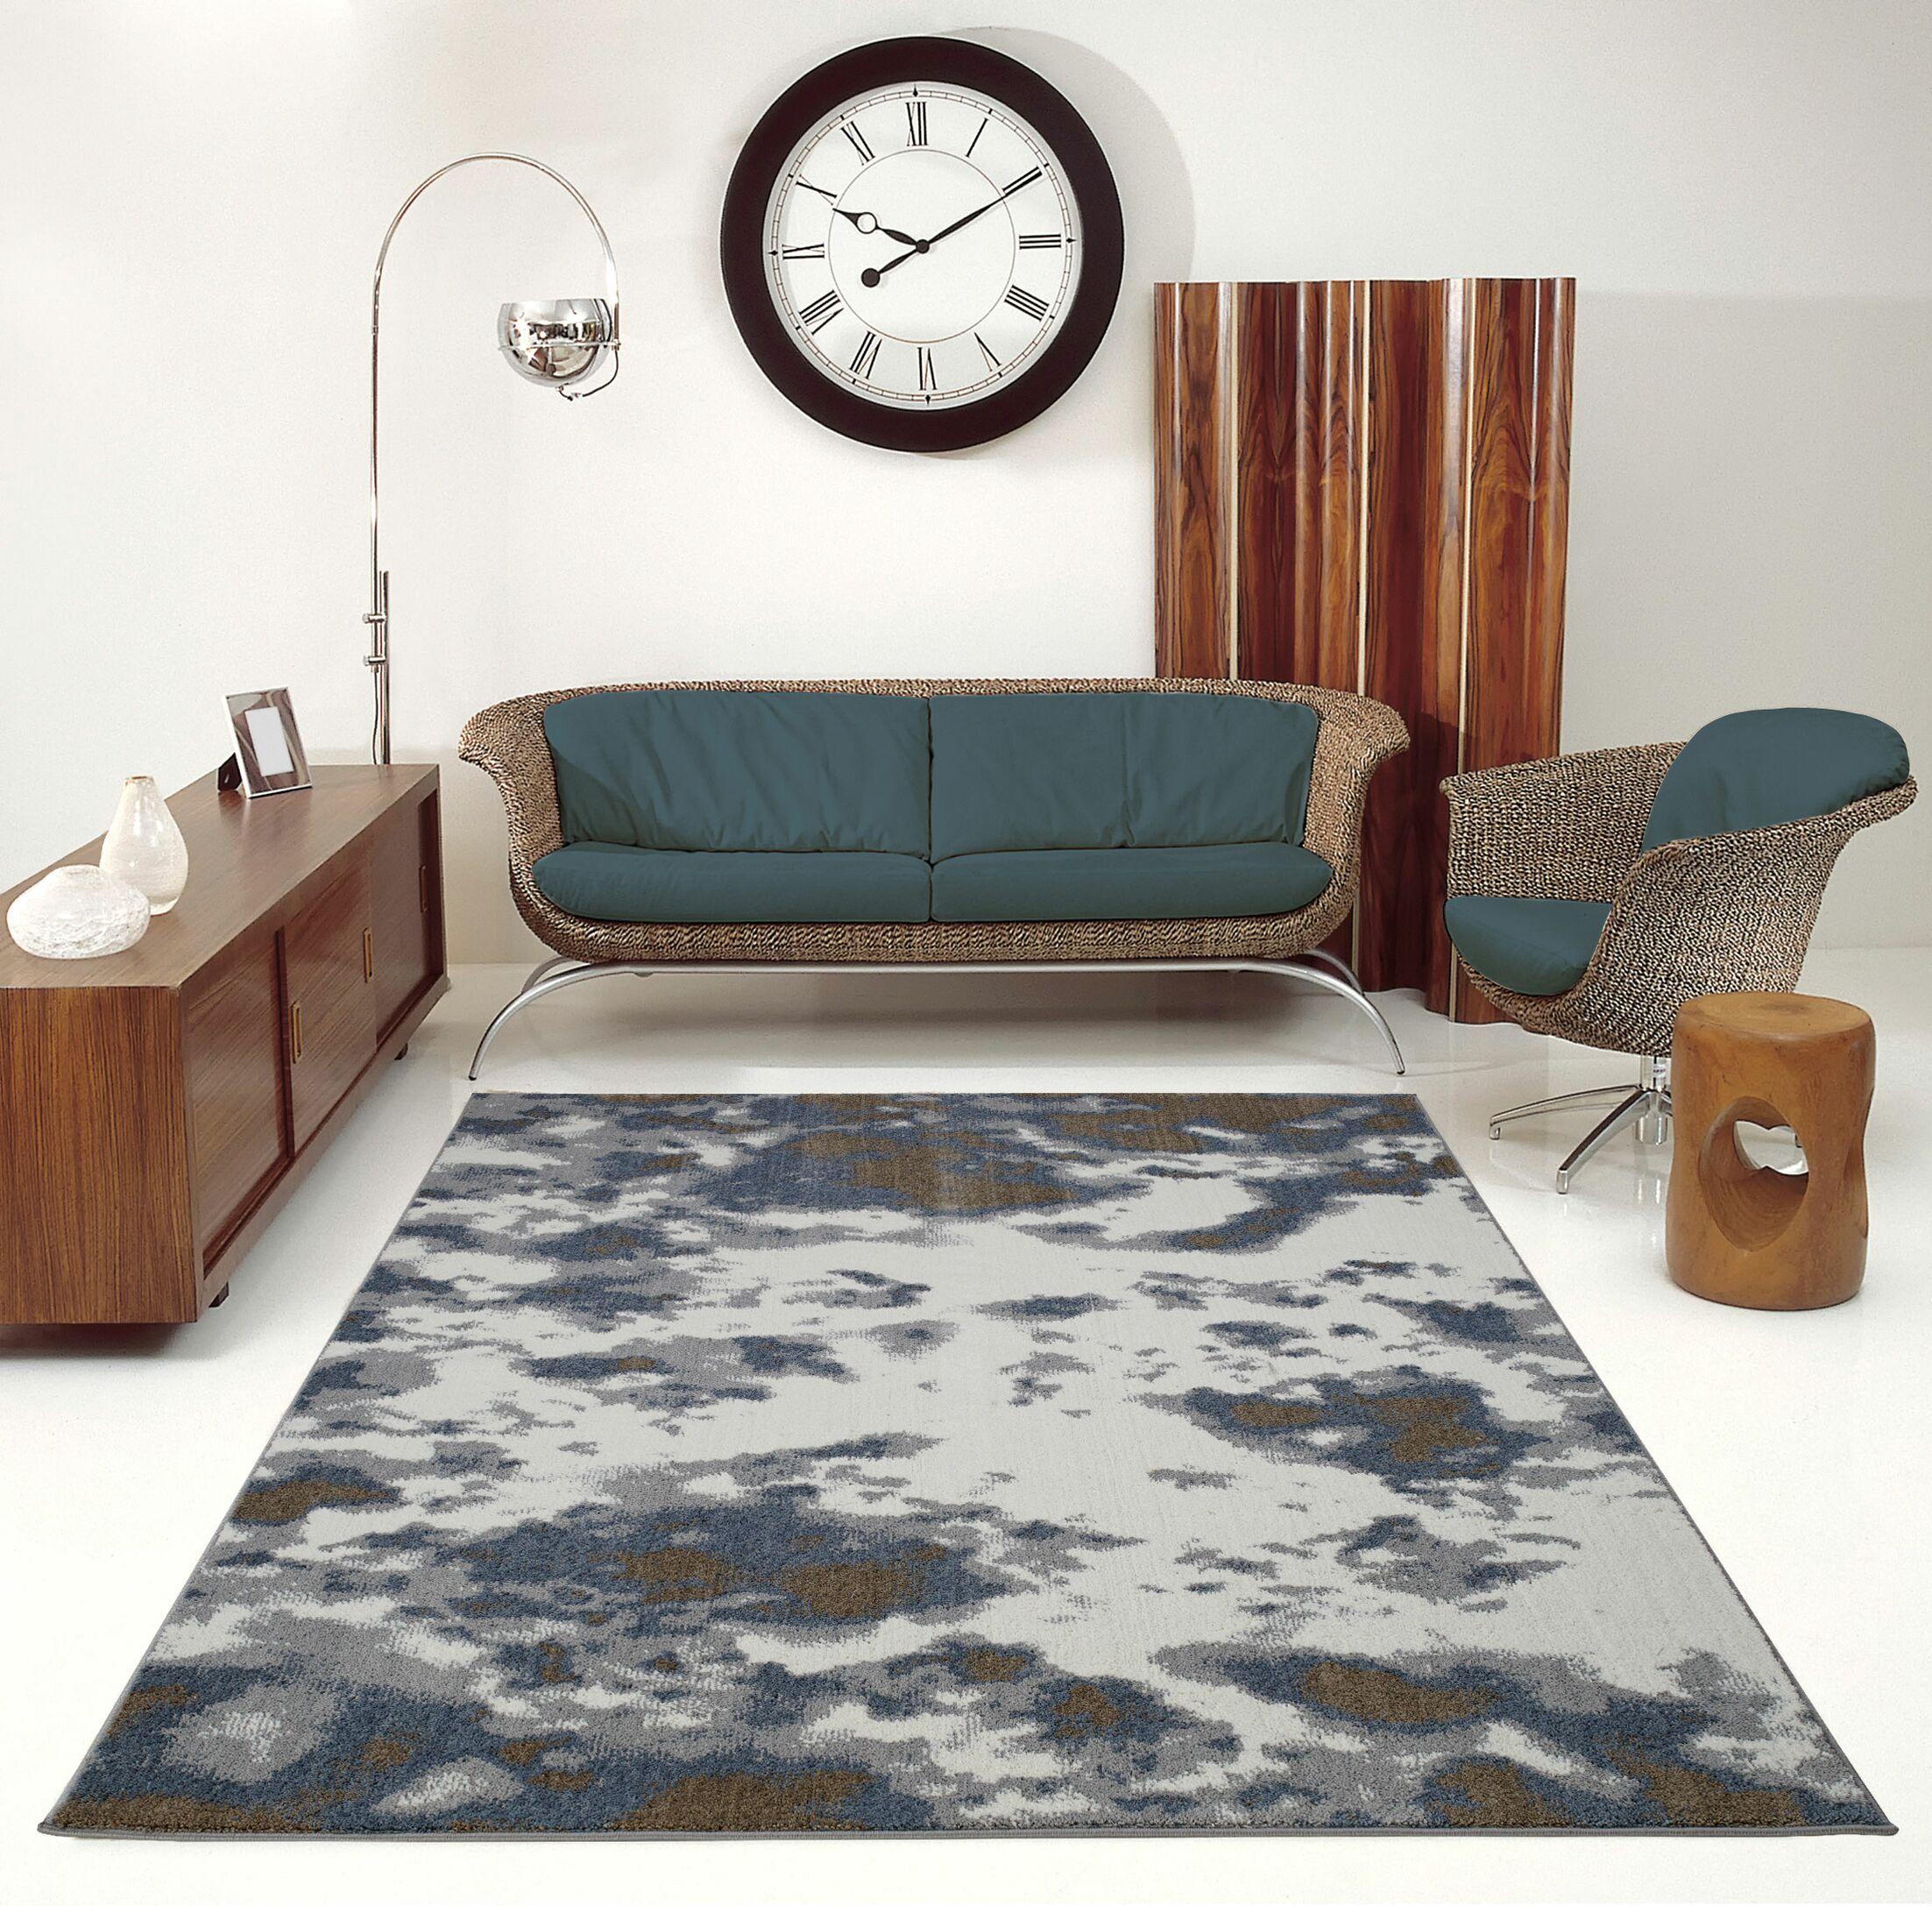 Toronto Brampton Ivory/Gray Area Rug Rug Size: Rectangle 5'3